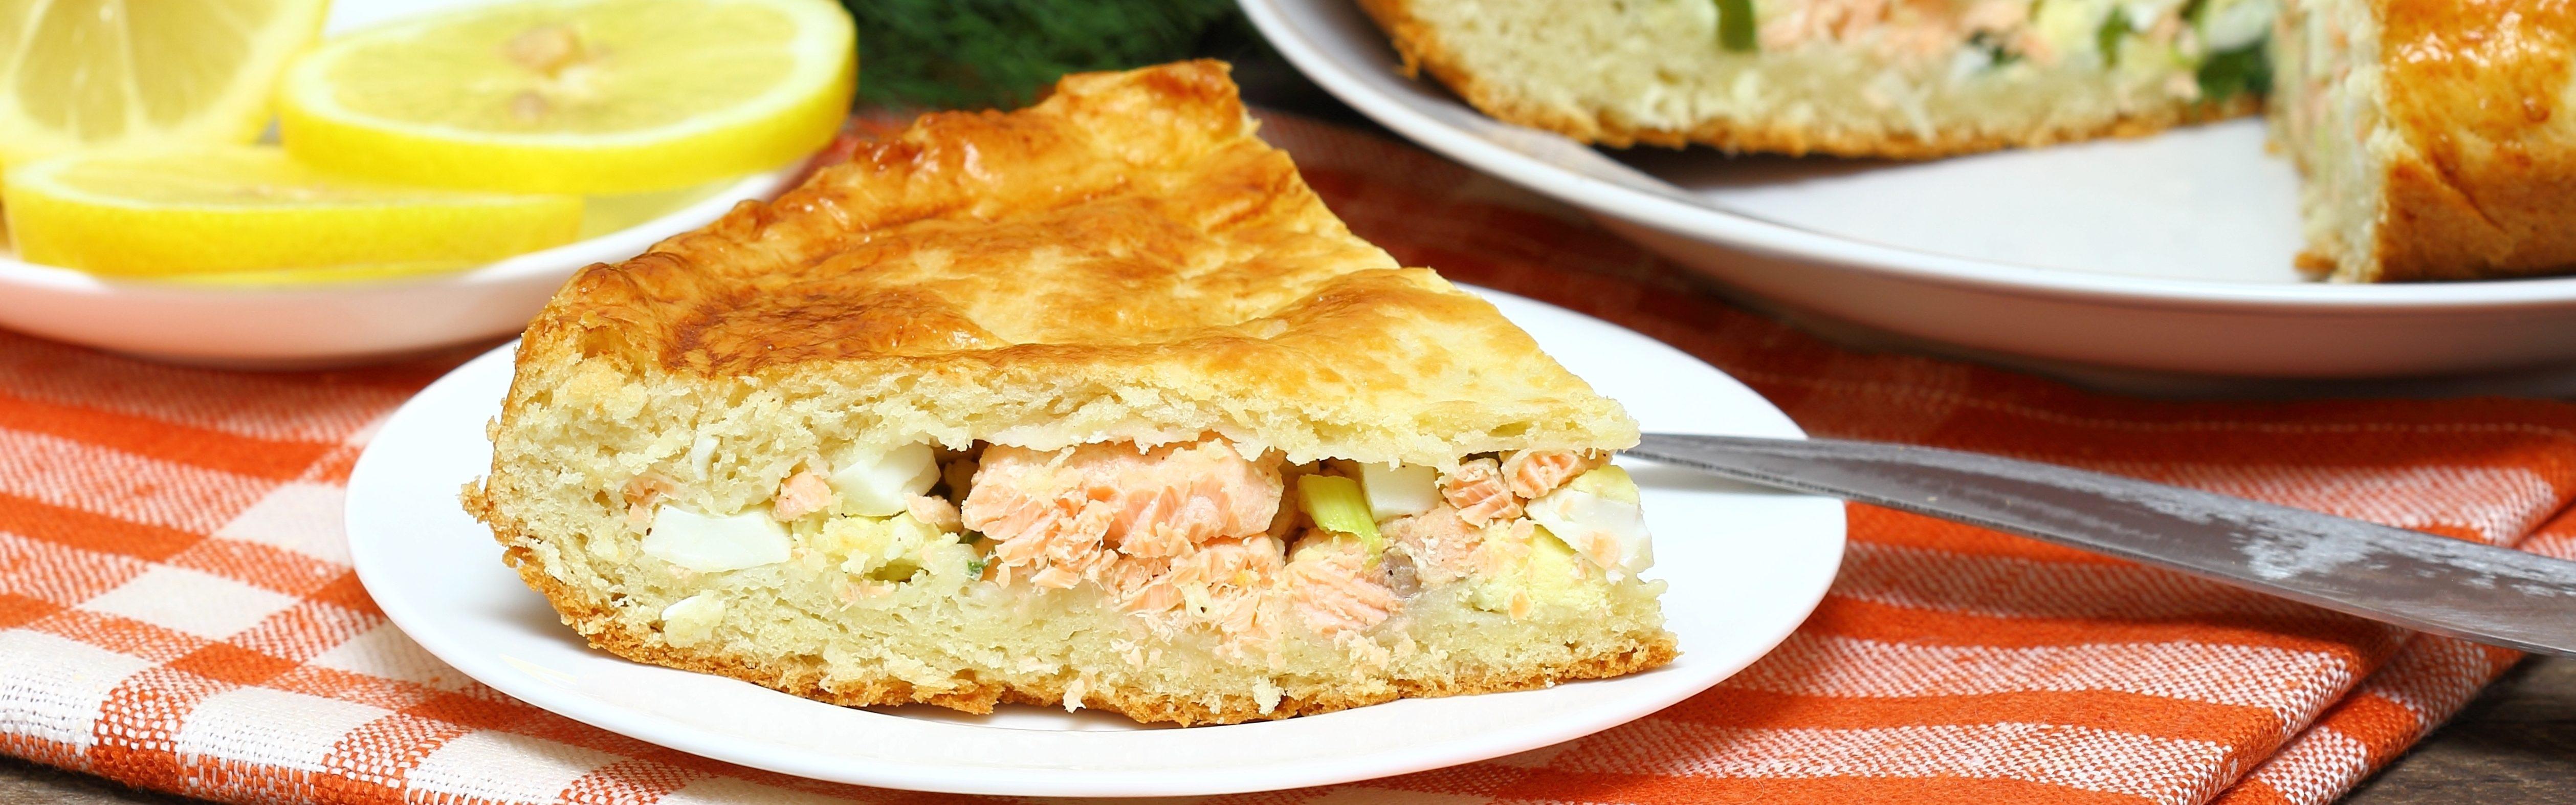 Lemon Fish Pie With Amstel Radler